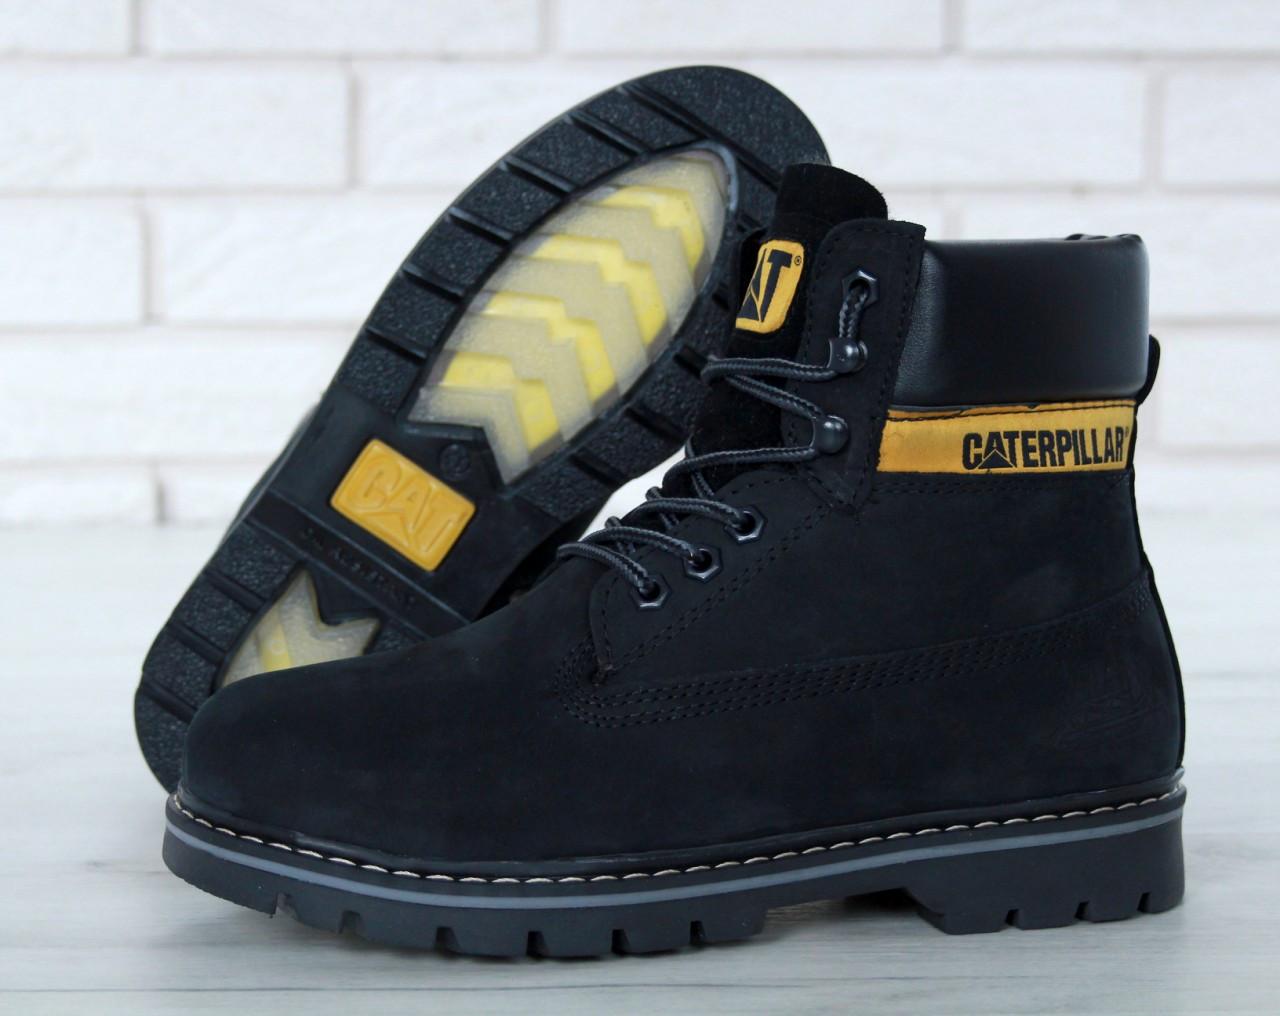 30840683 Мужские зимние ботинки Caterpillar Colorado Fur, мужские ботинки. ТОП  Реплика ААА класса. -